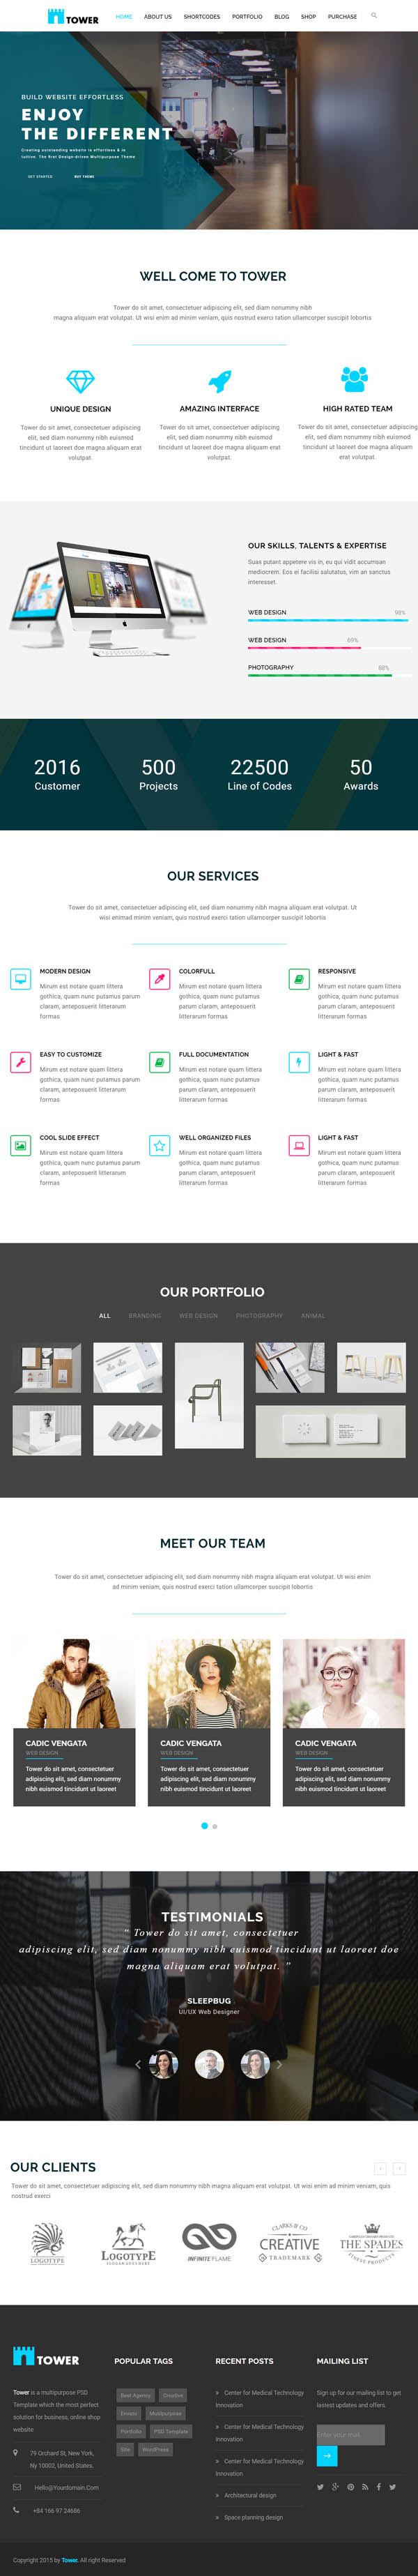 TOWER – Corporate Business Multipurpose WordPress Theme